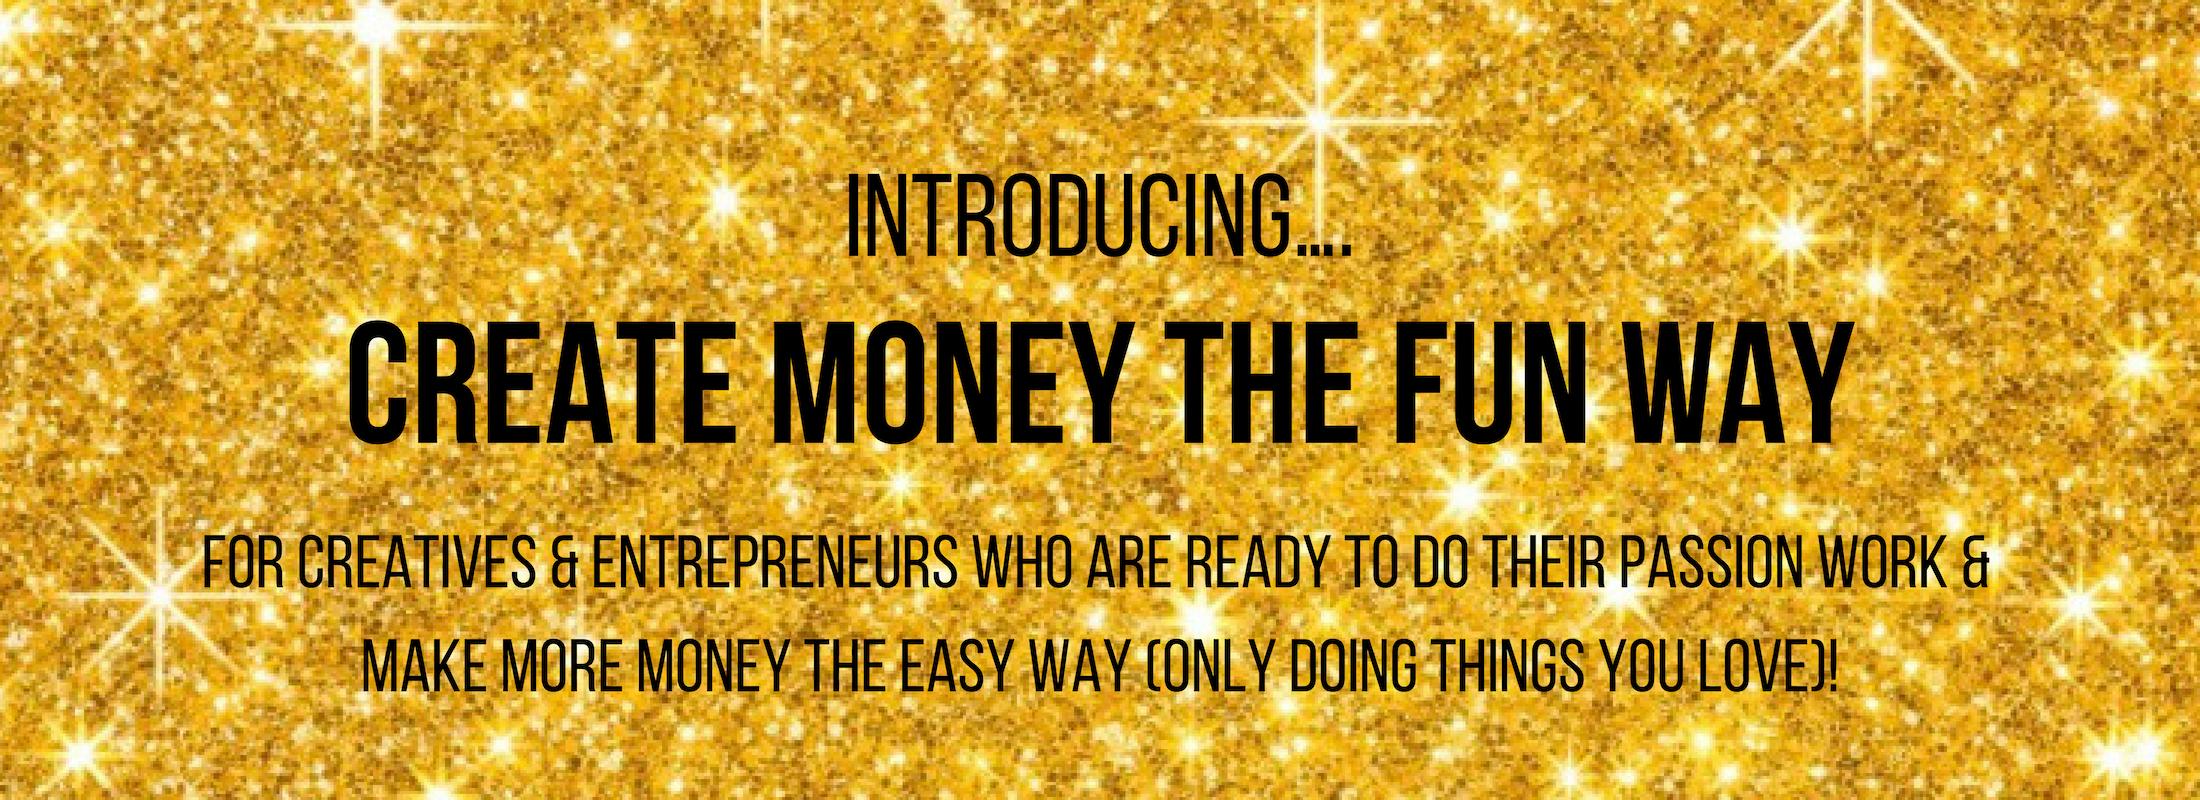 Create Money the Fun Way.jpg